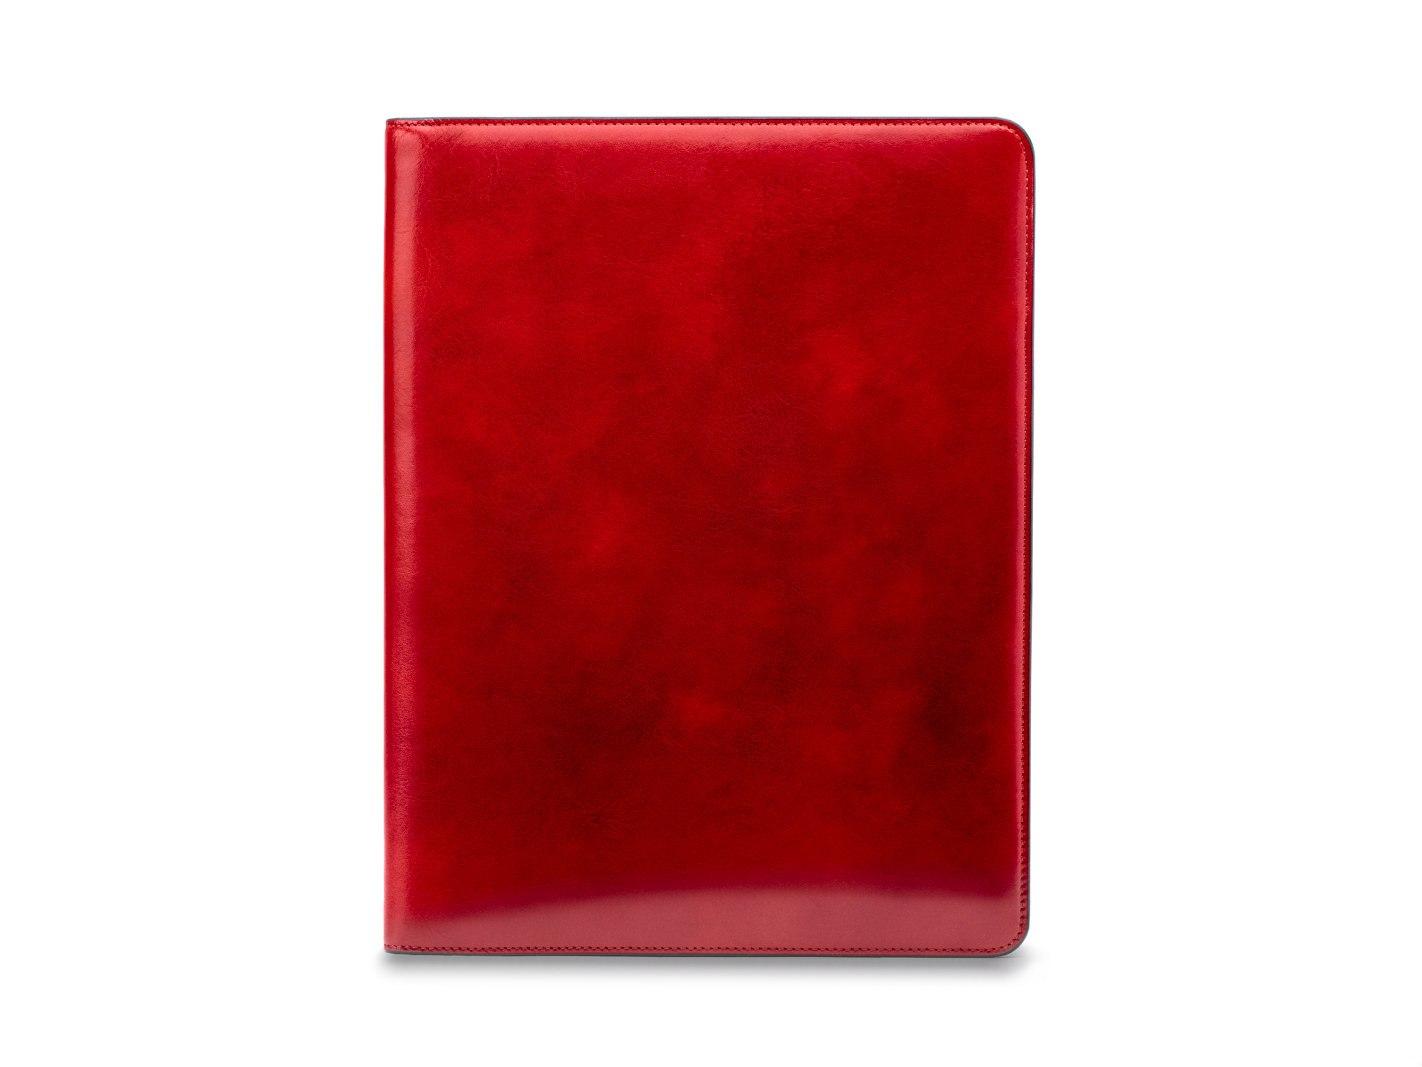 Leather Portfolio - 24 Brick Red